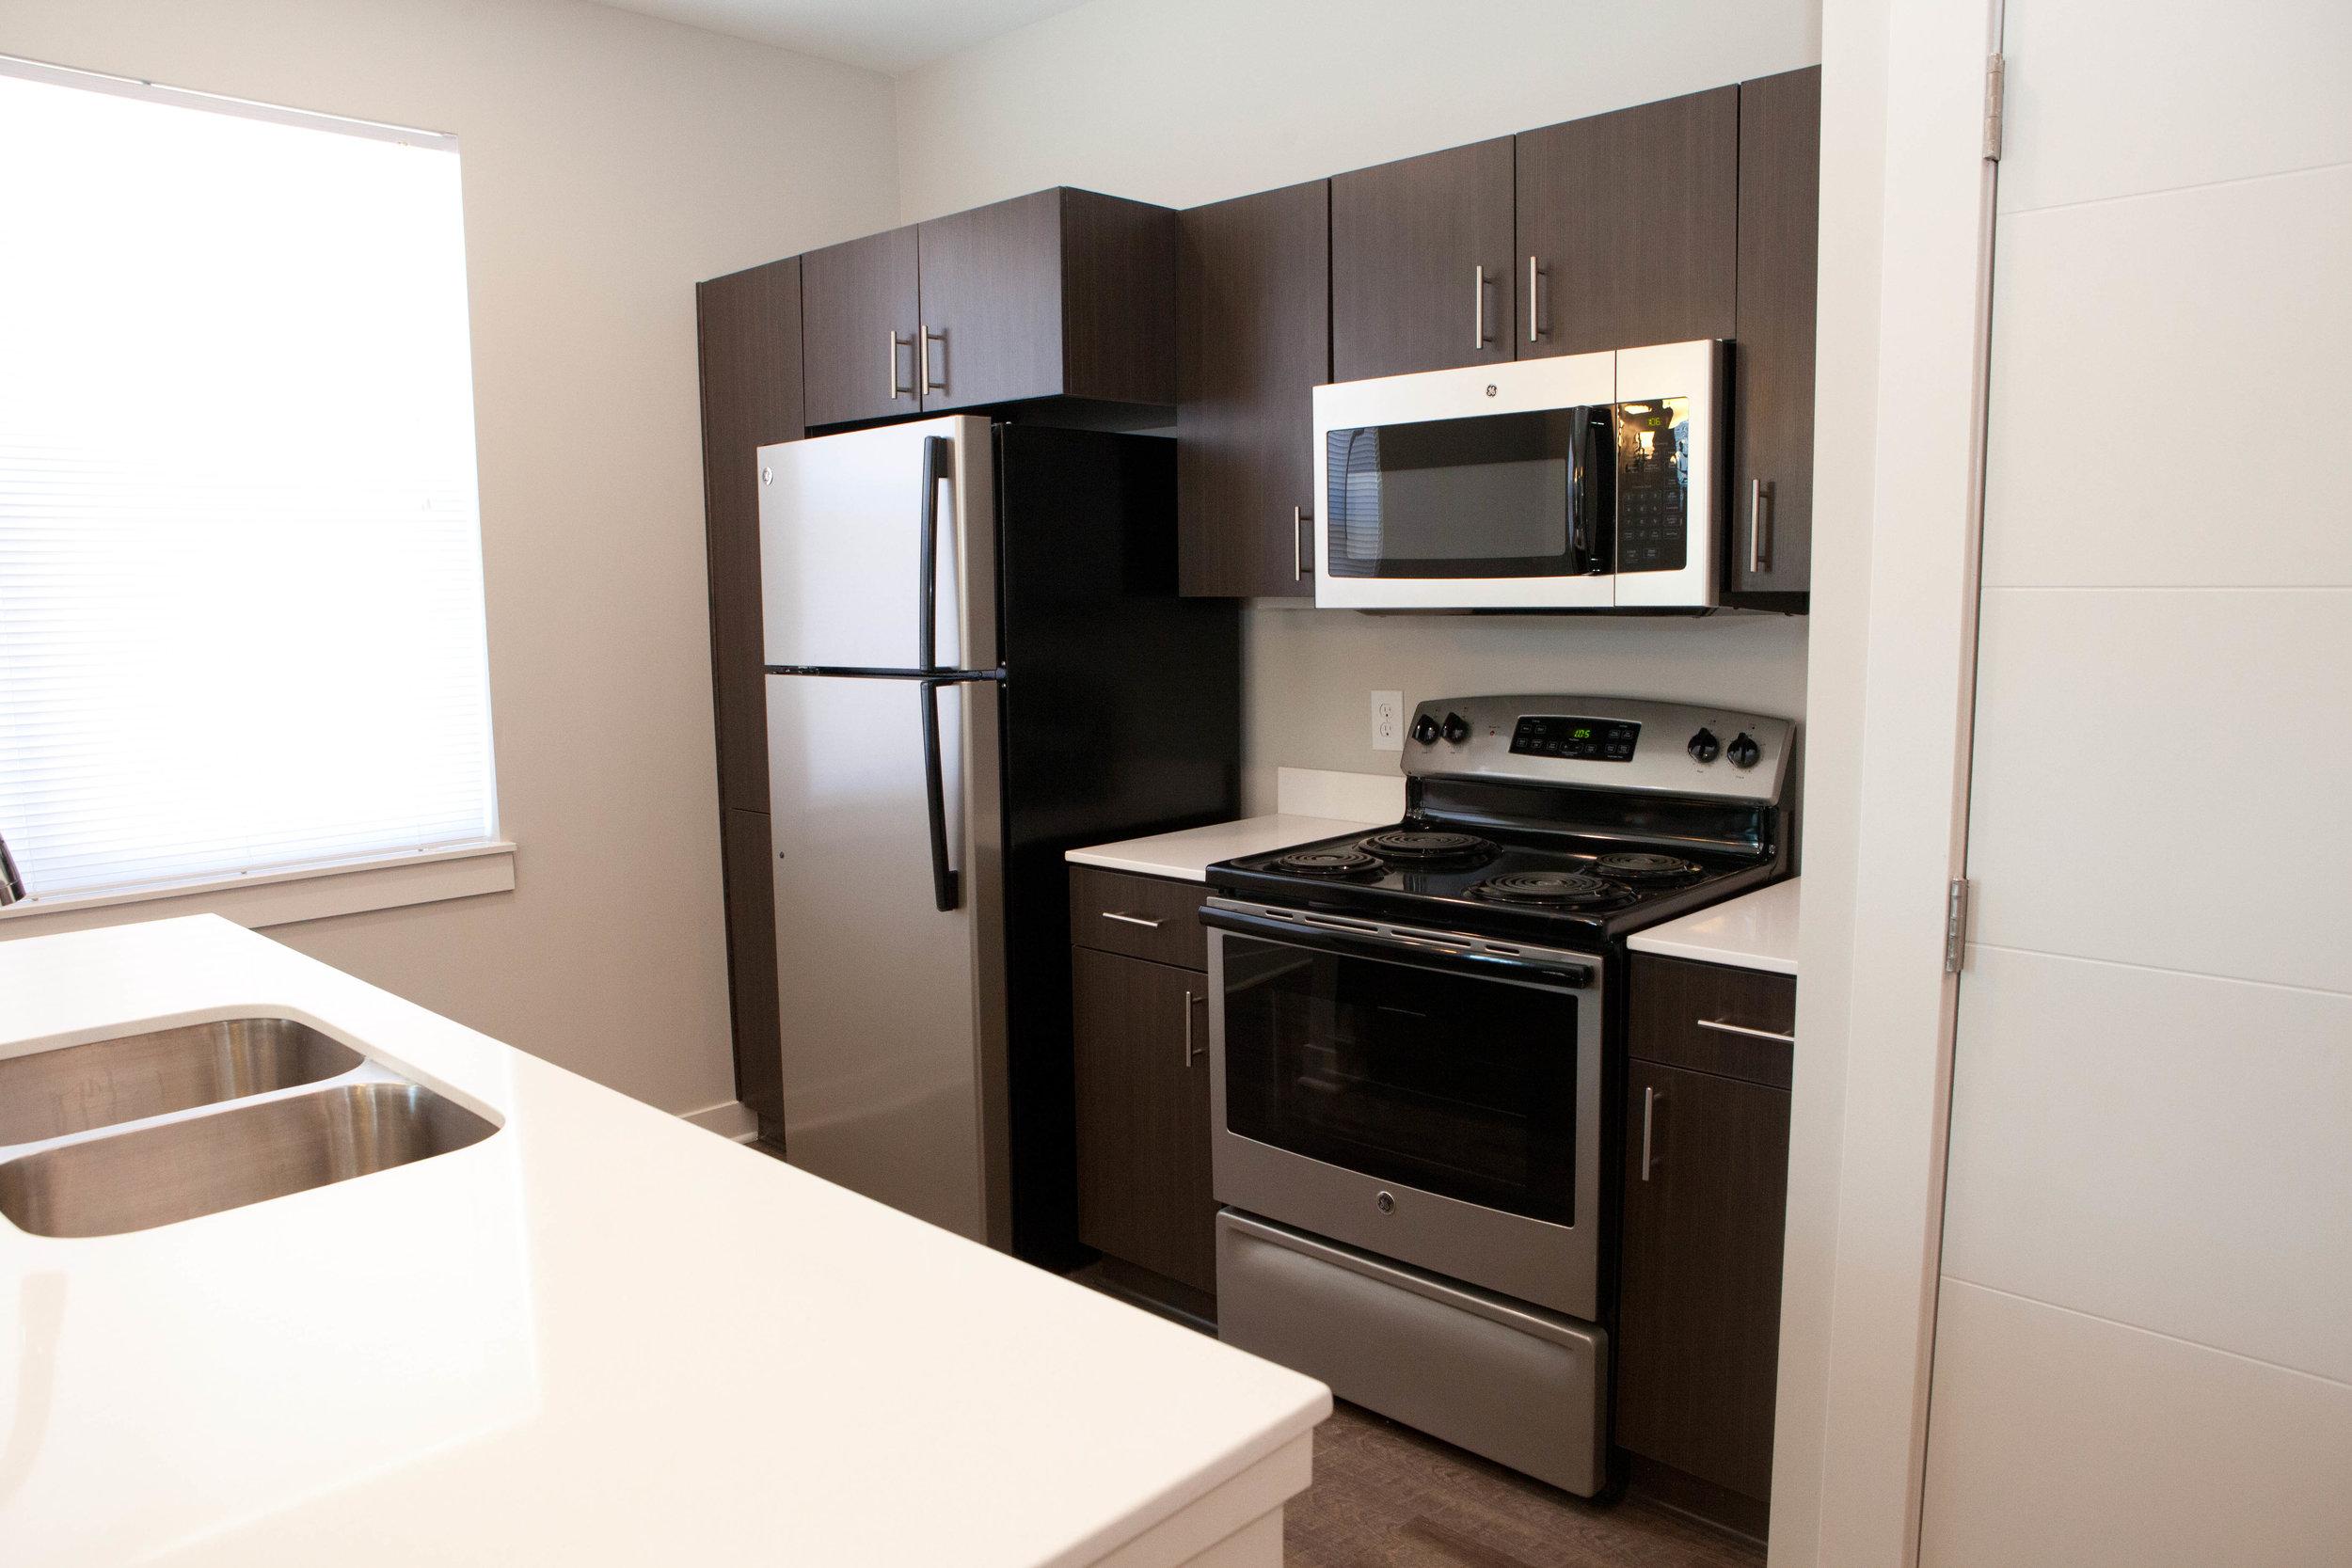 City Flats on Walnut - model kitchen (apartment).JPG